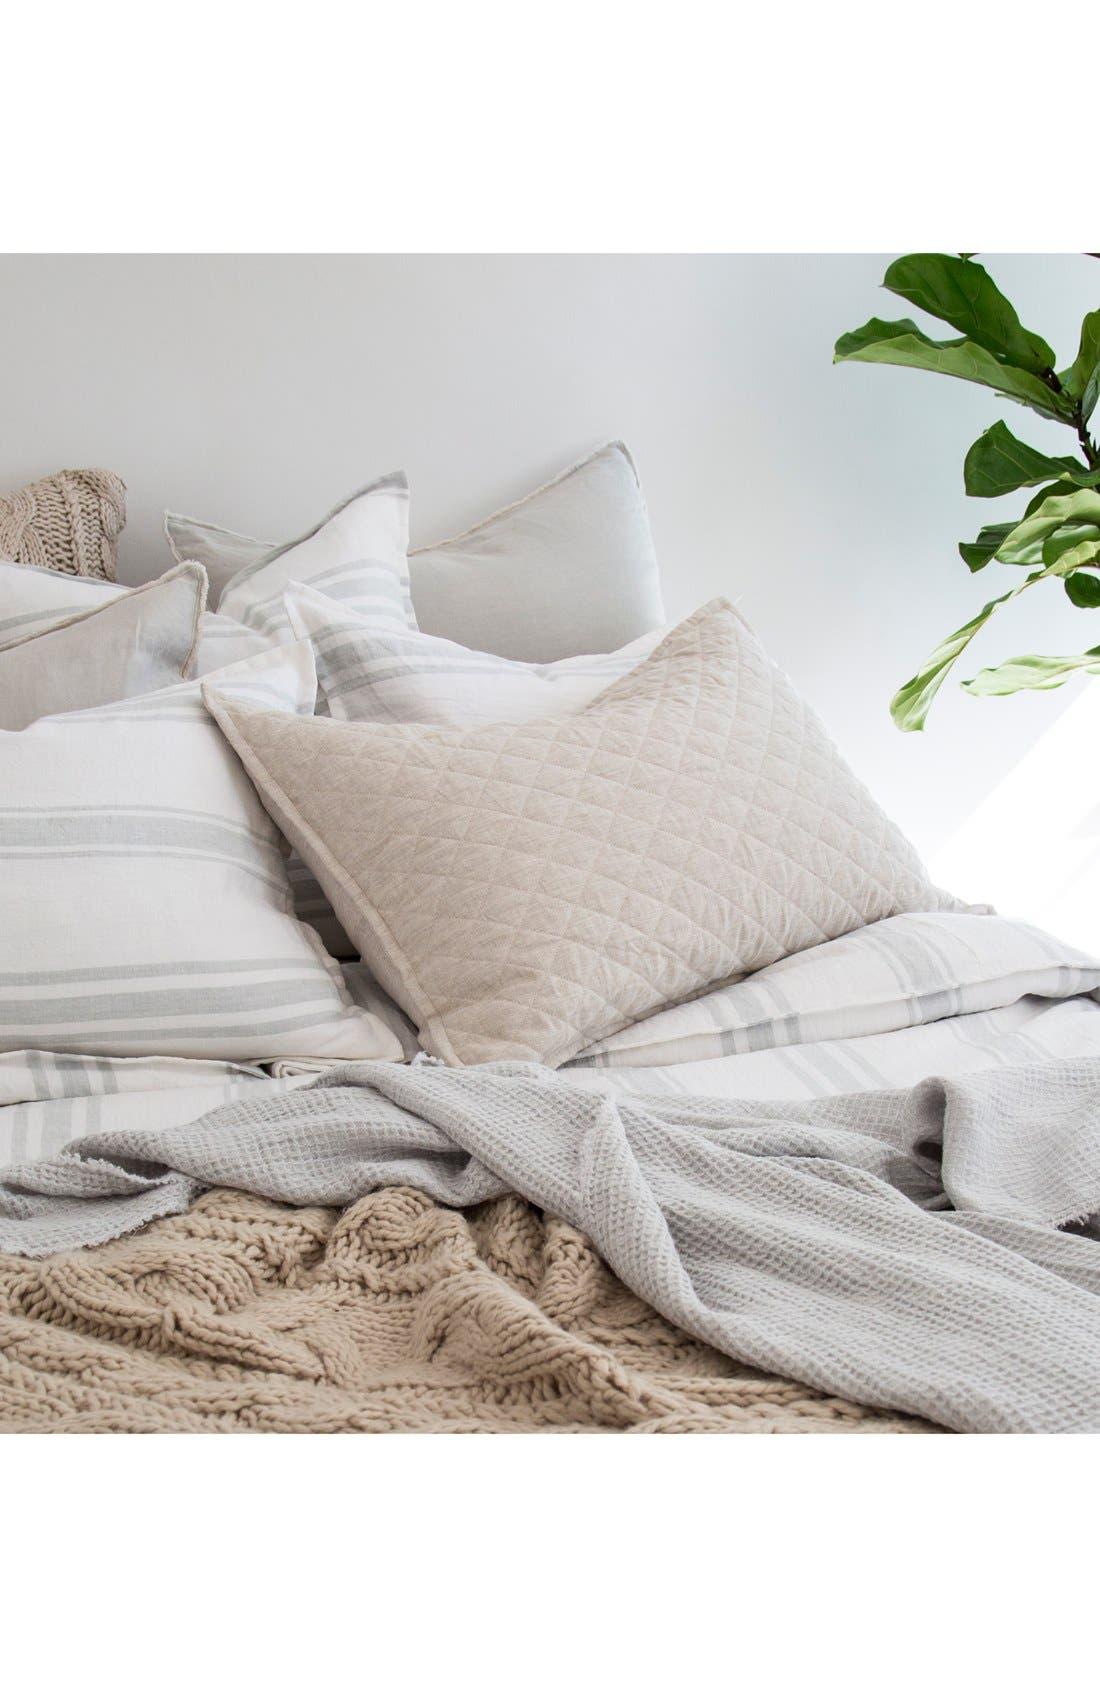 'Blair' Linen Euro Pillow Sham,                             Alternate thumbnail 2, color,                             Taupe